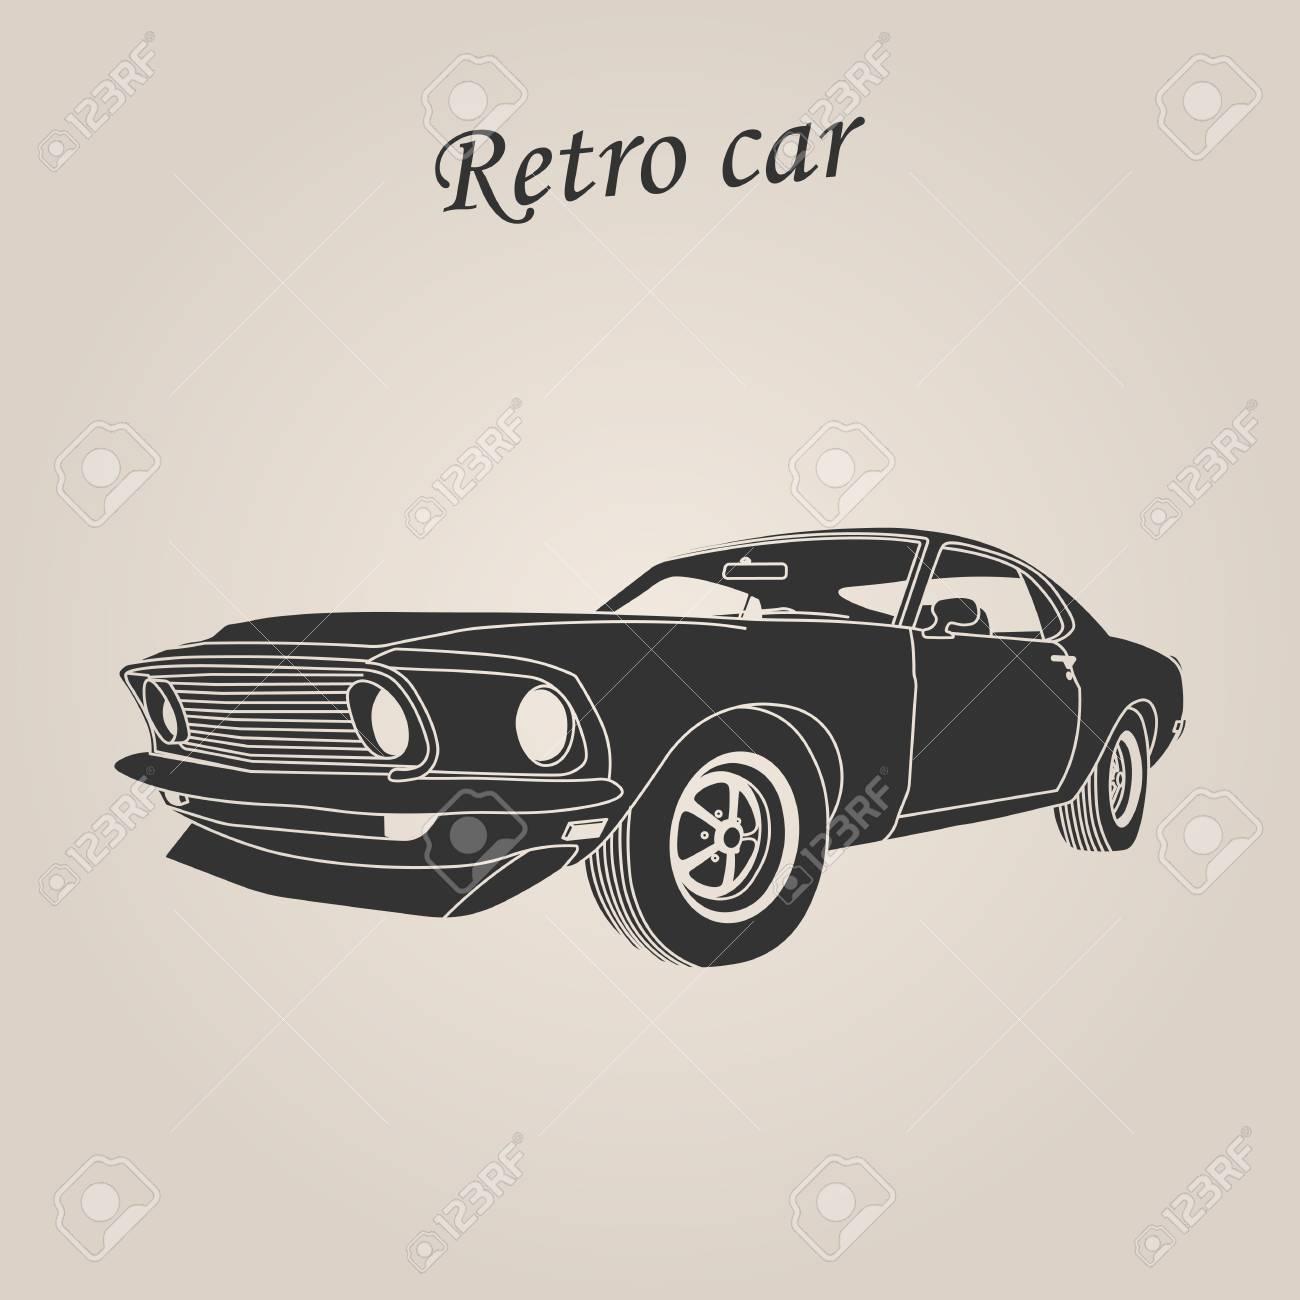 Vintage Car Retro Car Classic Car Illustration Royalty Free